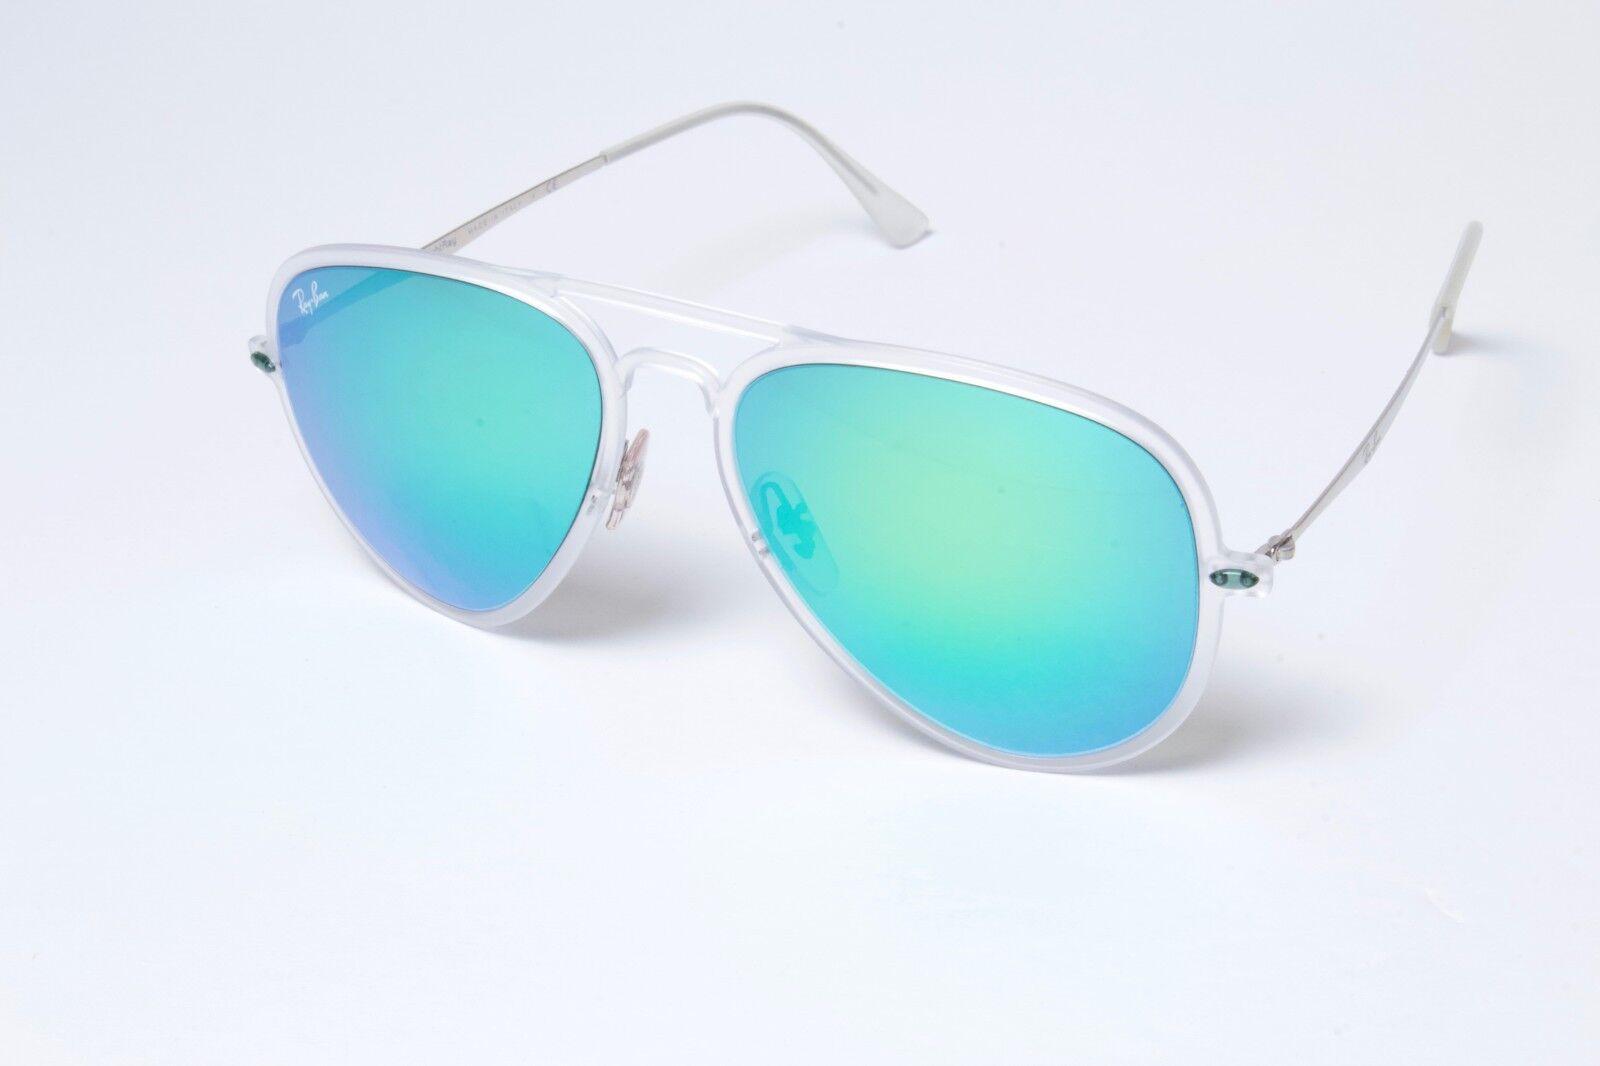 bdcbd01ef0 Ray-Ban Sunglasses Aviator Light Ray II Silver Green Mirror Lens ...